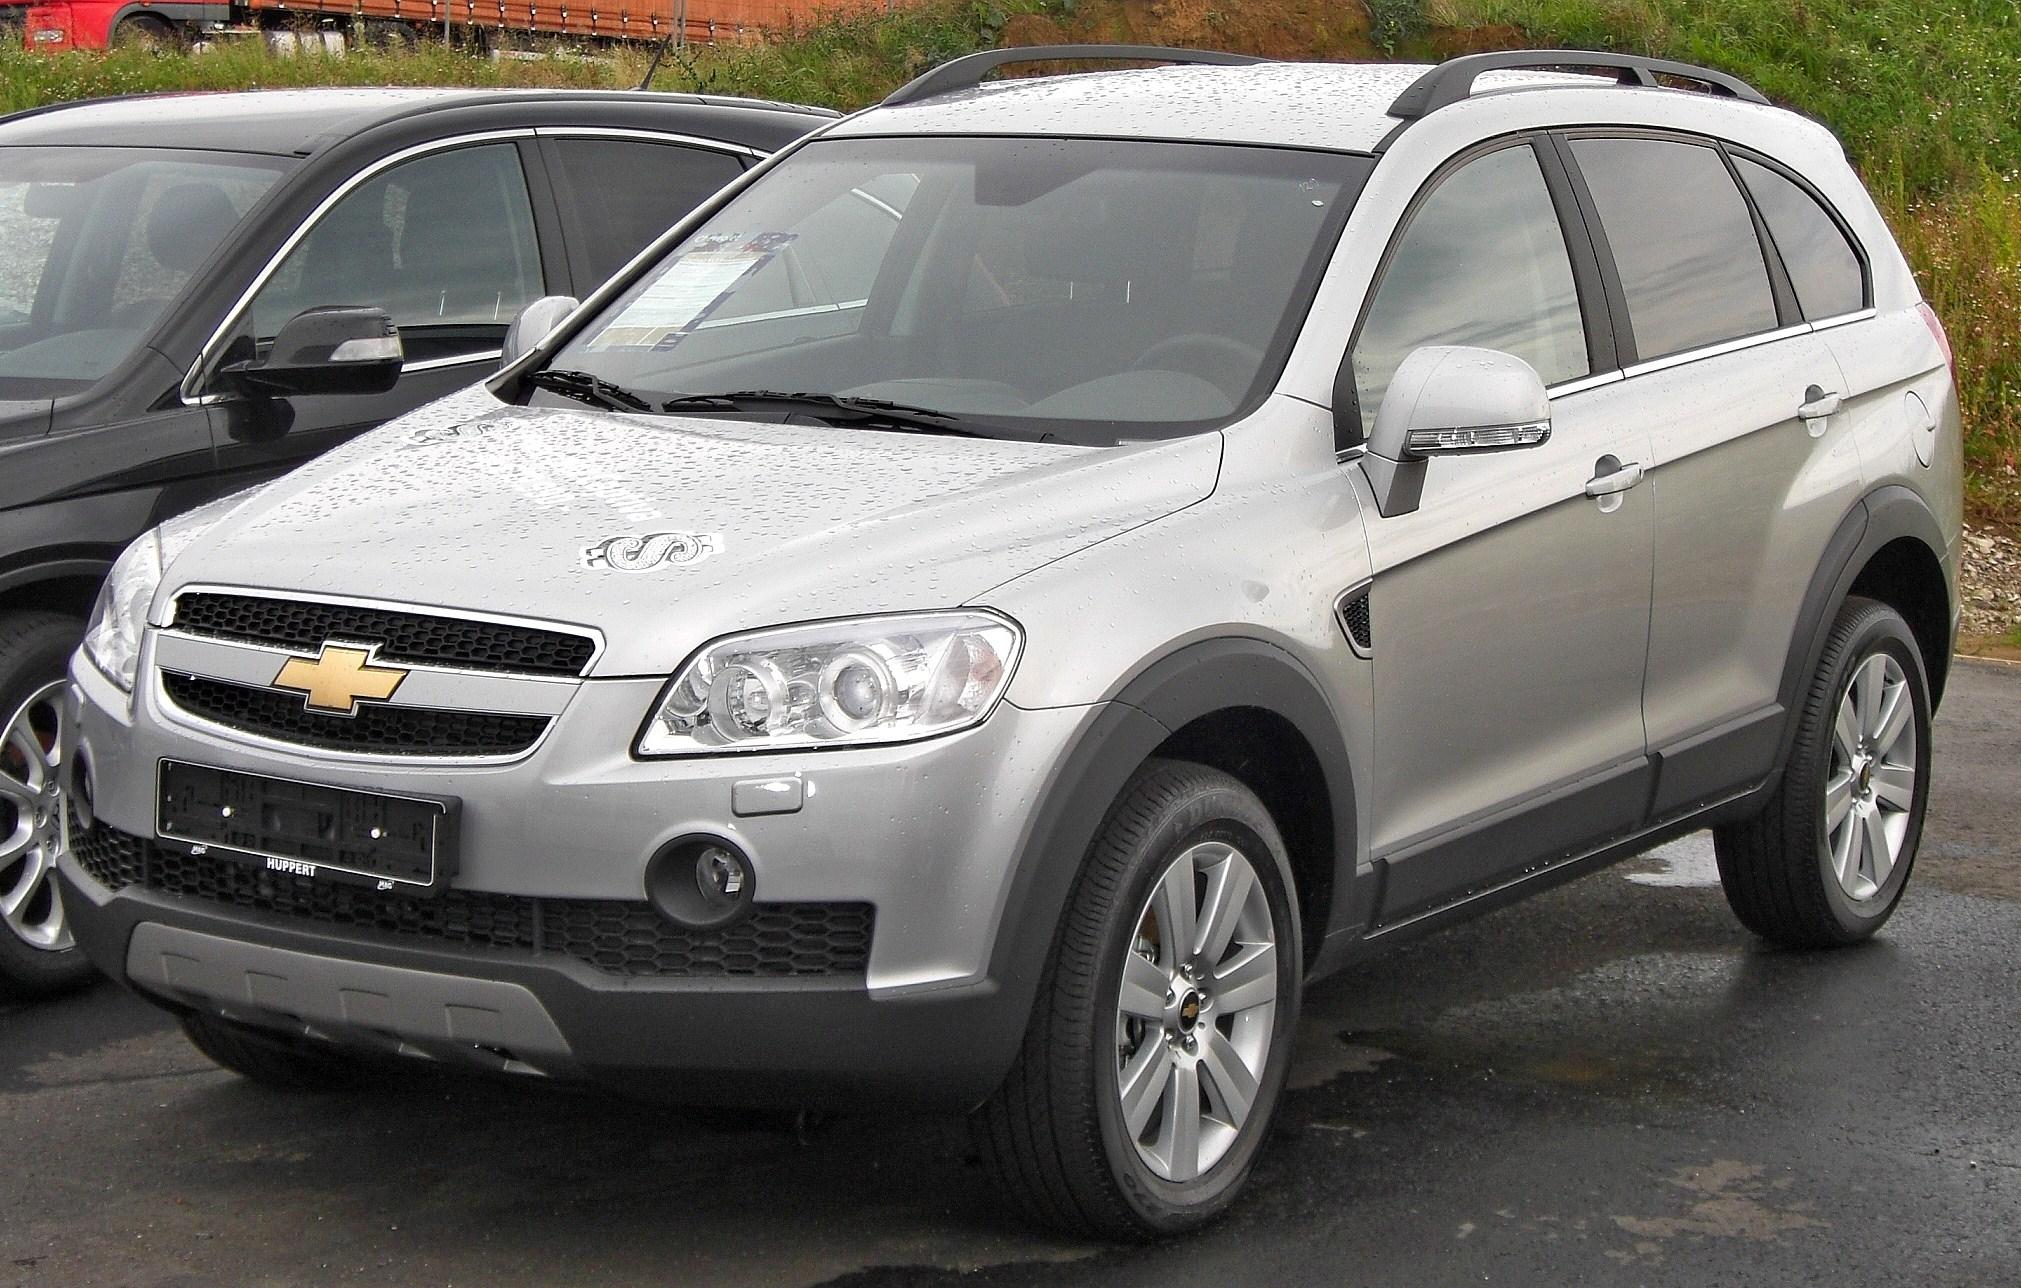 Chevrolet clipart chevrolet captiva Src;  Chevrolet Chevrolet 2011